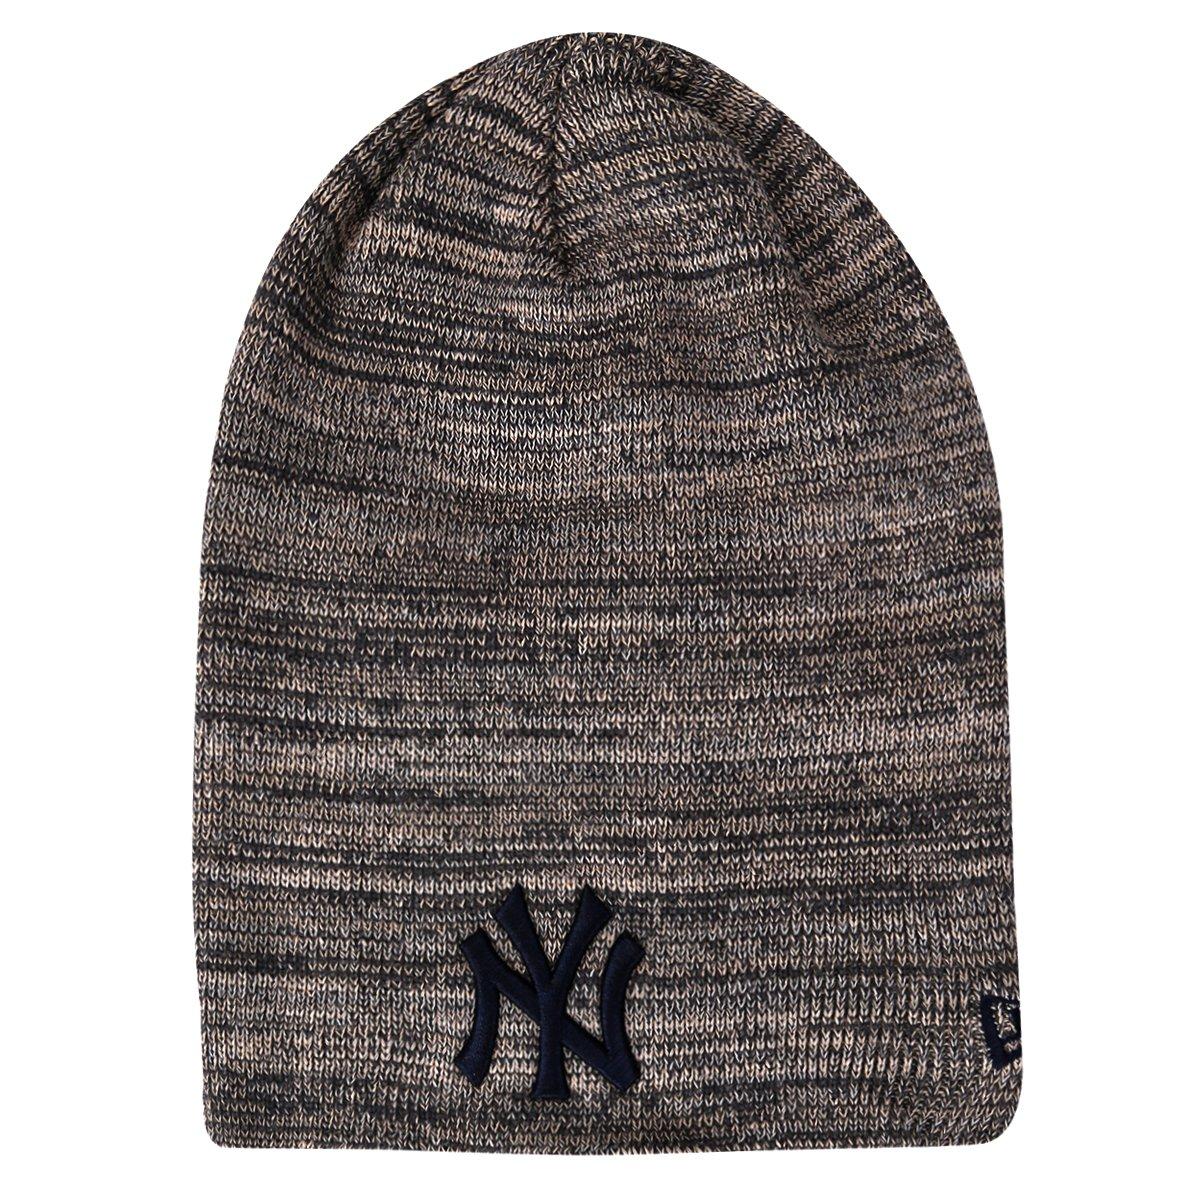 4a59a9564fad8 Gorro New Era MLB New York Yankees - Compre Agora